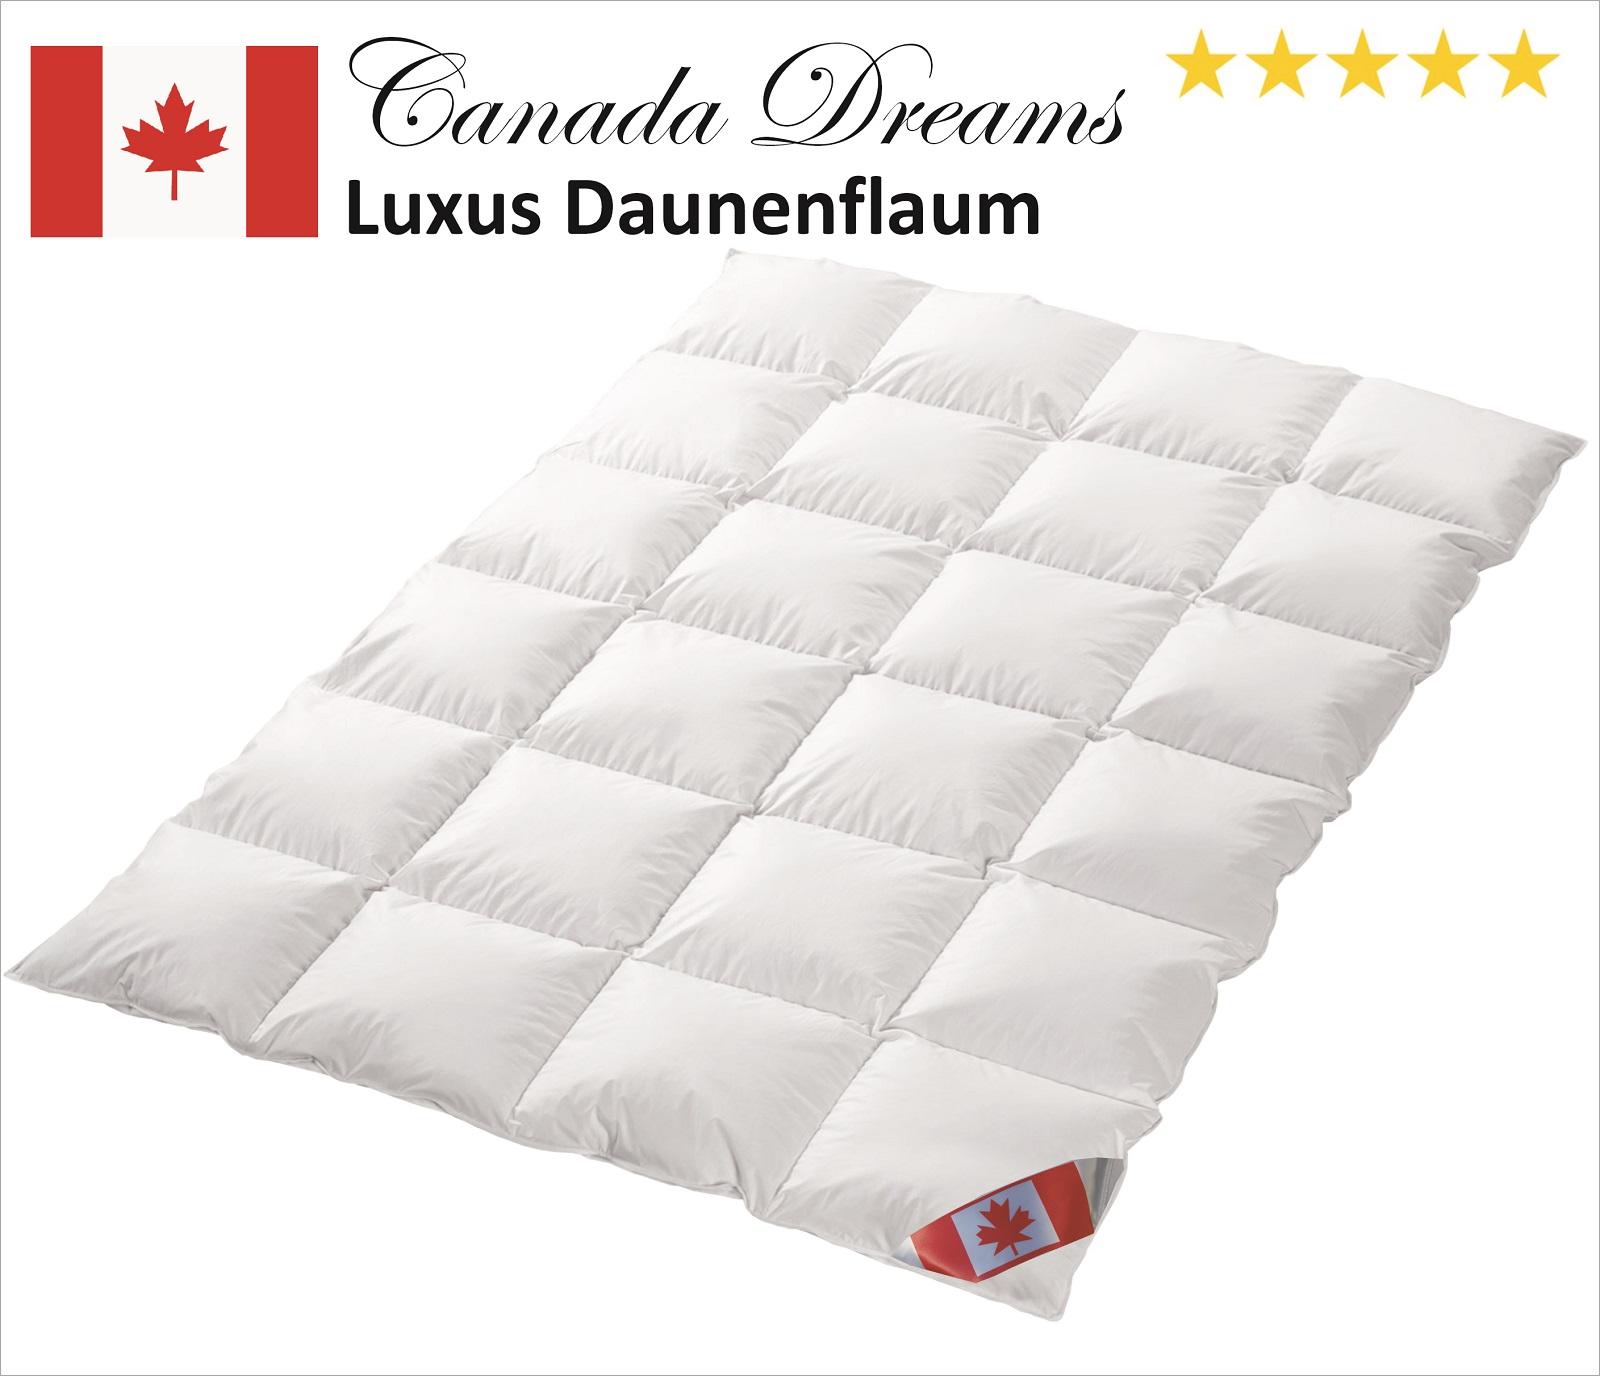 Canada Dreams Luxus Übergangs Daunendecke Daunenflaum CD 2 135x200 cm